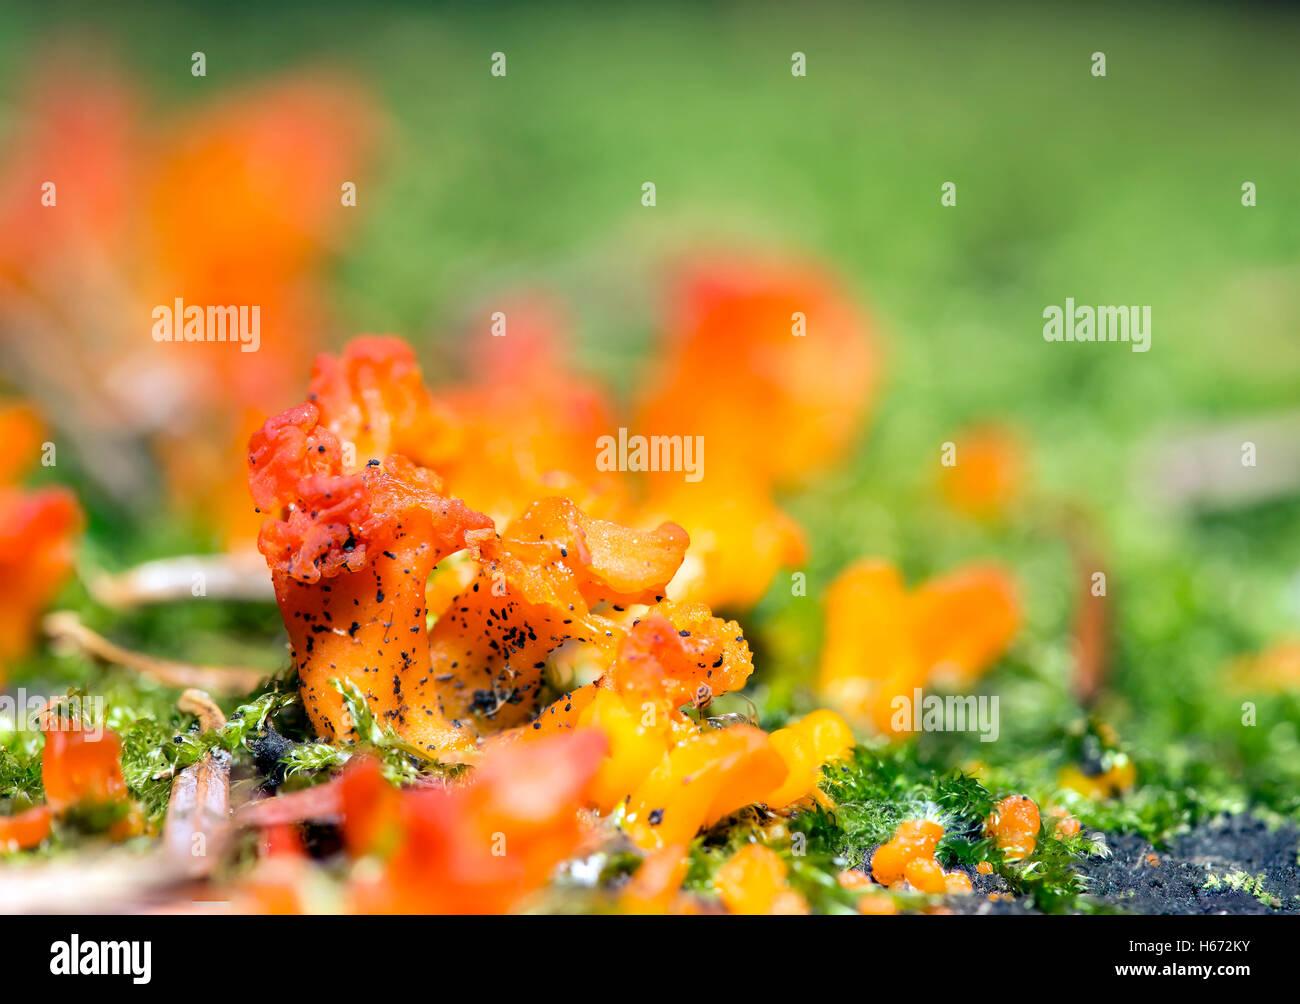 Tremella aurantia mushroom close up magnification. - Stock Image